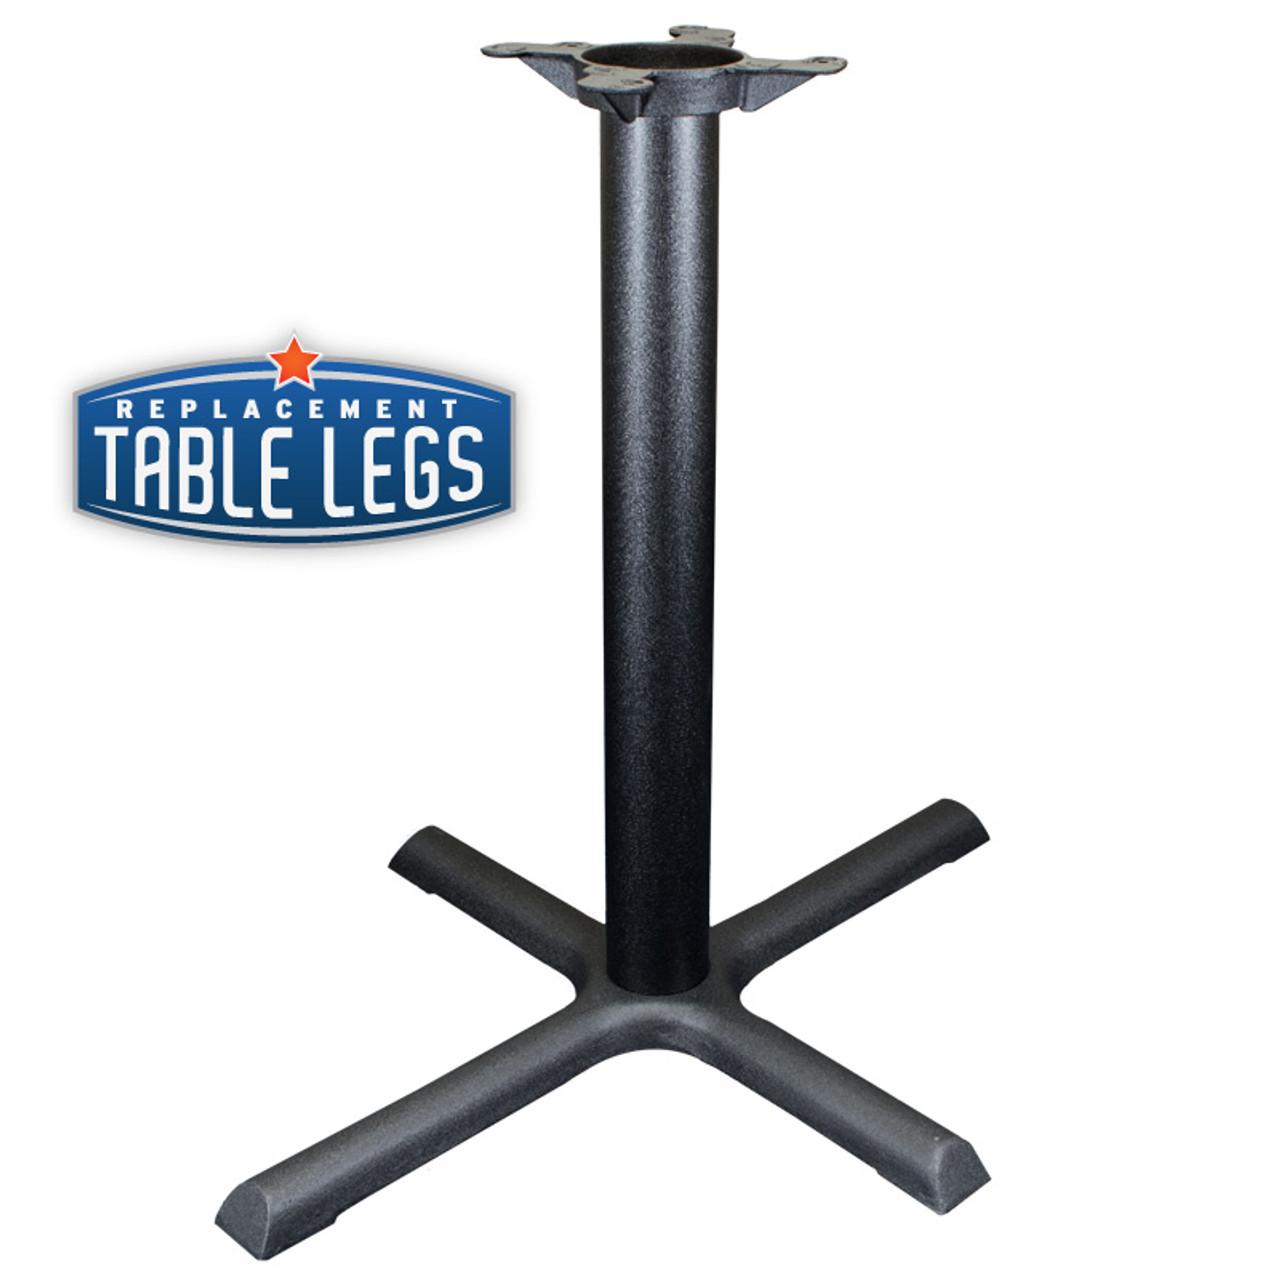 "CAST IRON TABLE BASE, X Style 24""x30"", 28"" height, 3"" diameter steel column - replacementtablelegs.com"